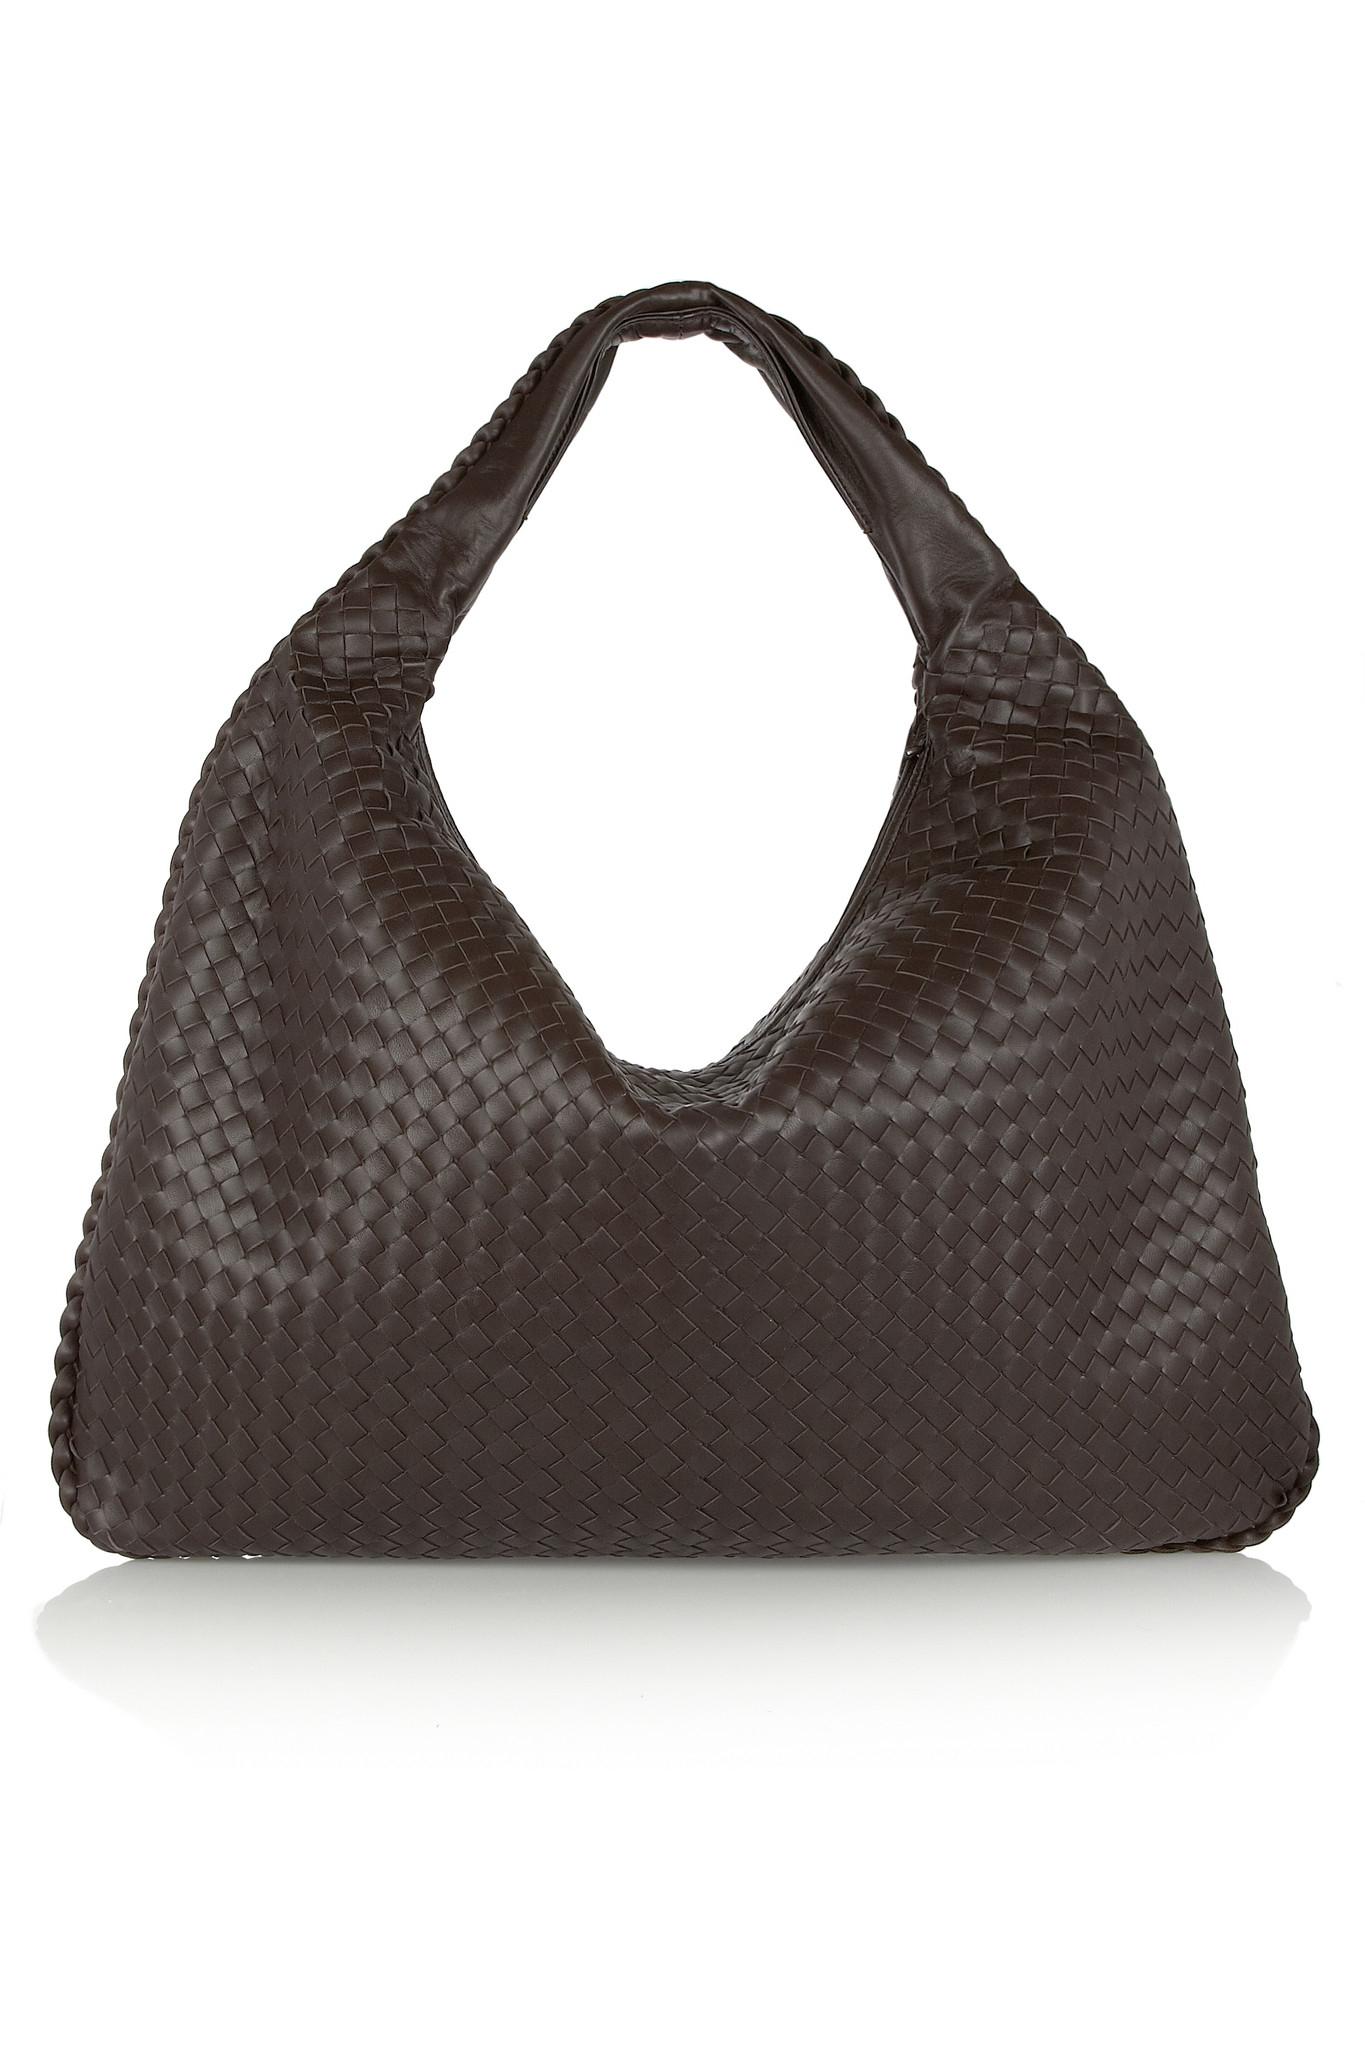 25d837d7d378 bottega veneta outlet online - Bottega veneta Maxi Veneta Intrecciato  Leather Shoulder Bag in .